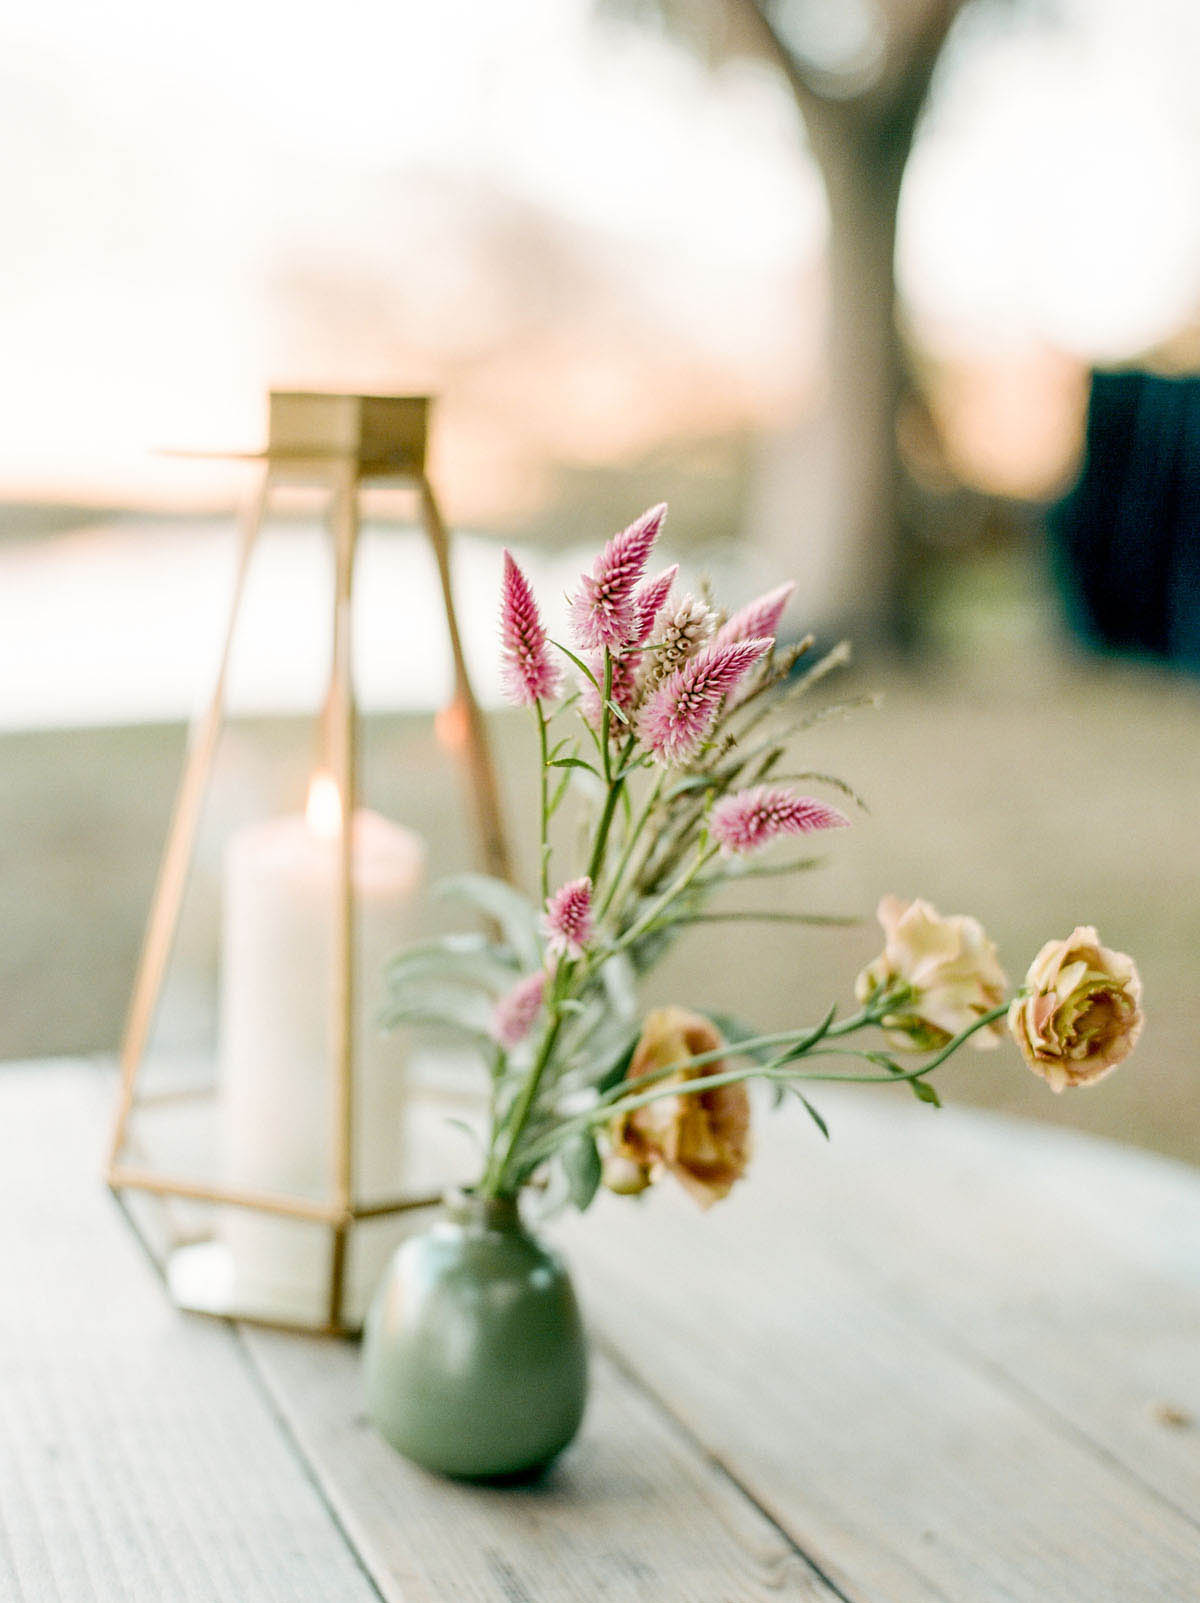 32-eothen-floral-centerpiece.jpg